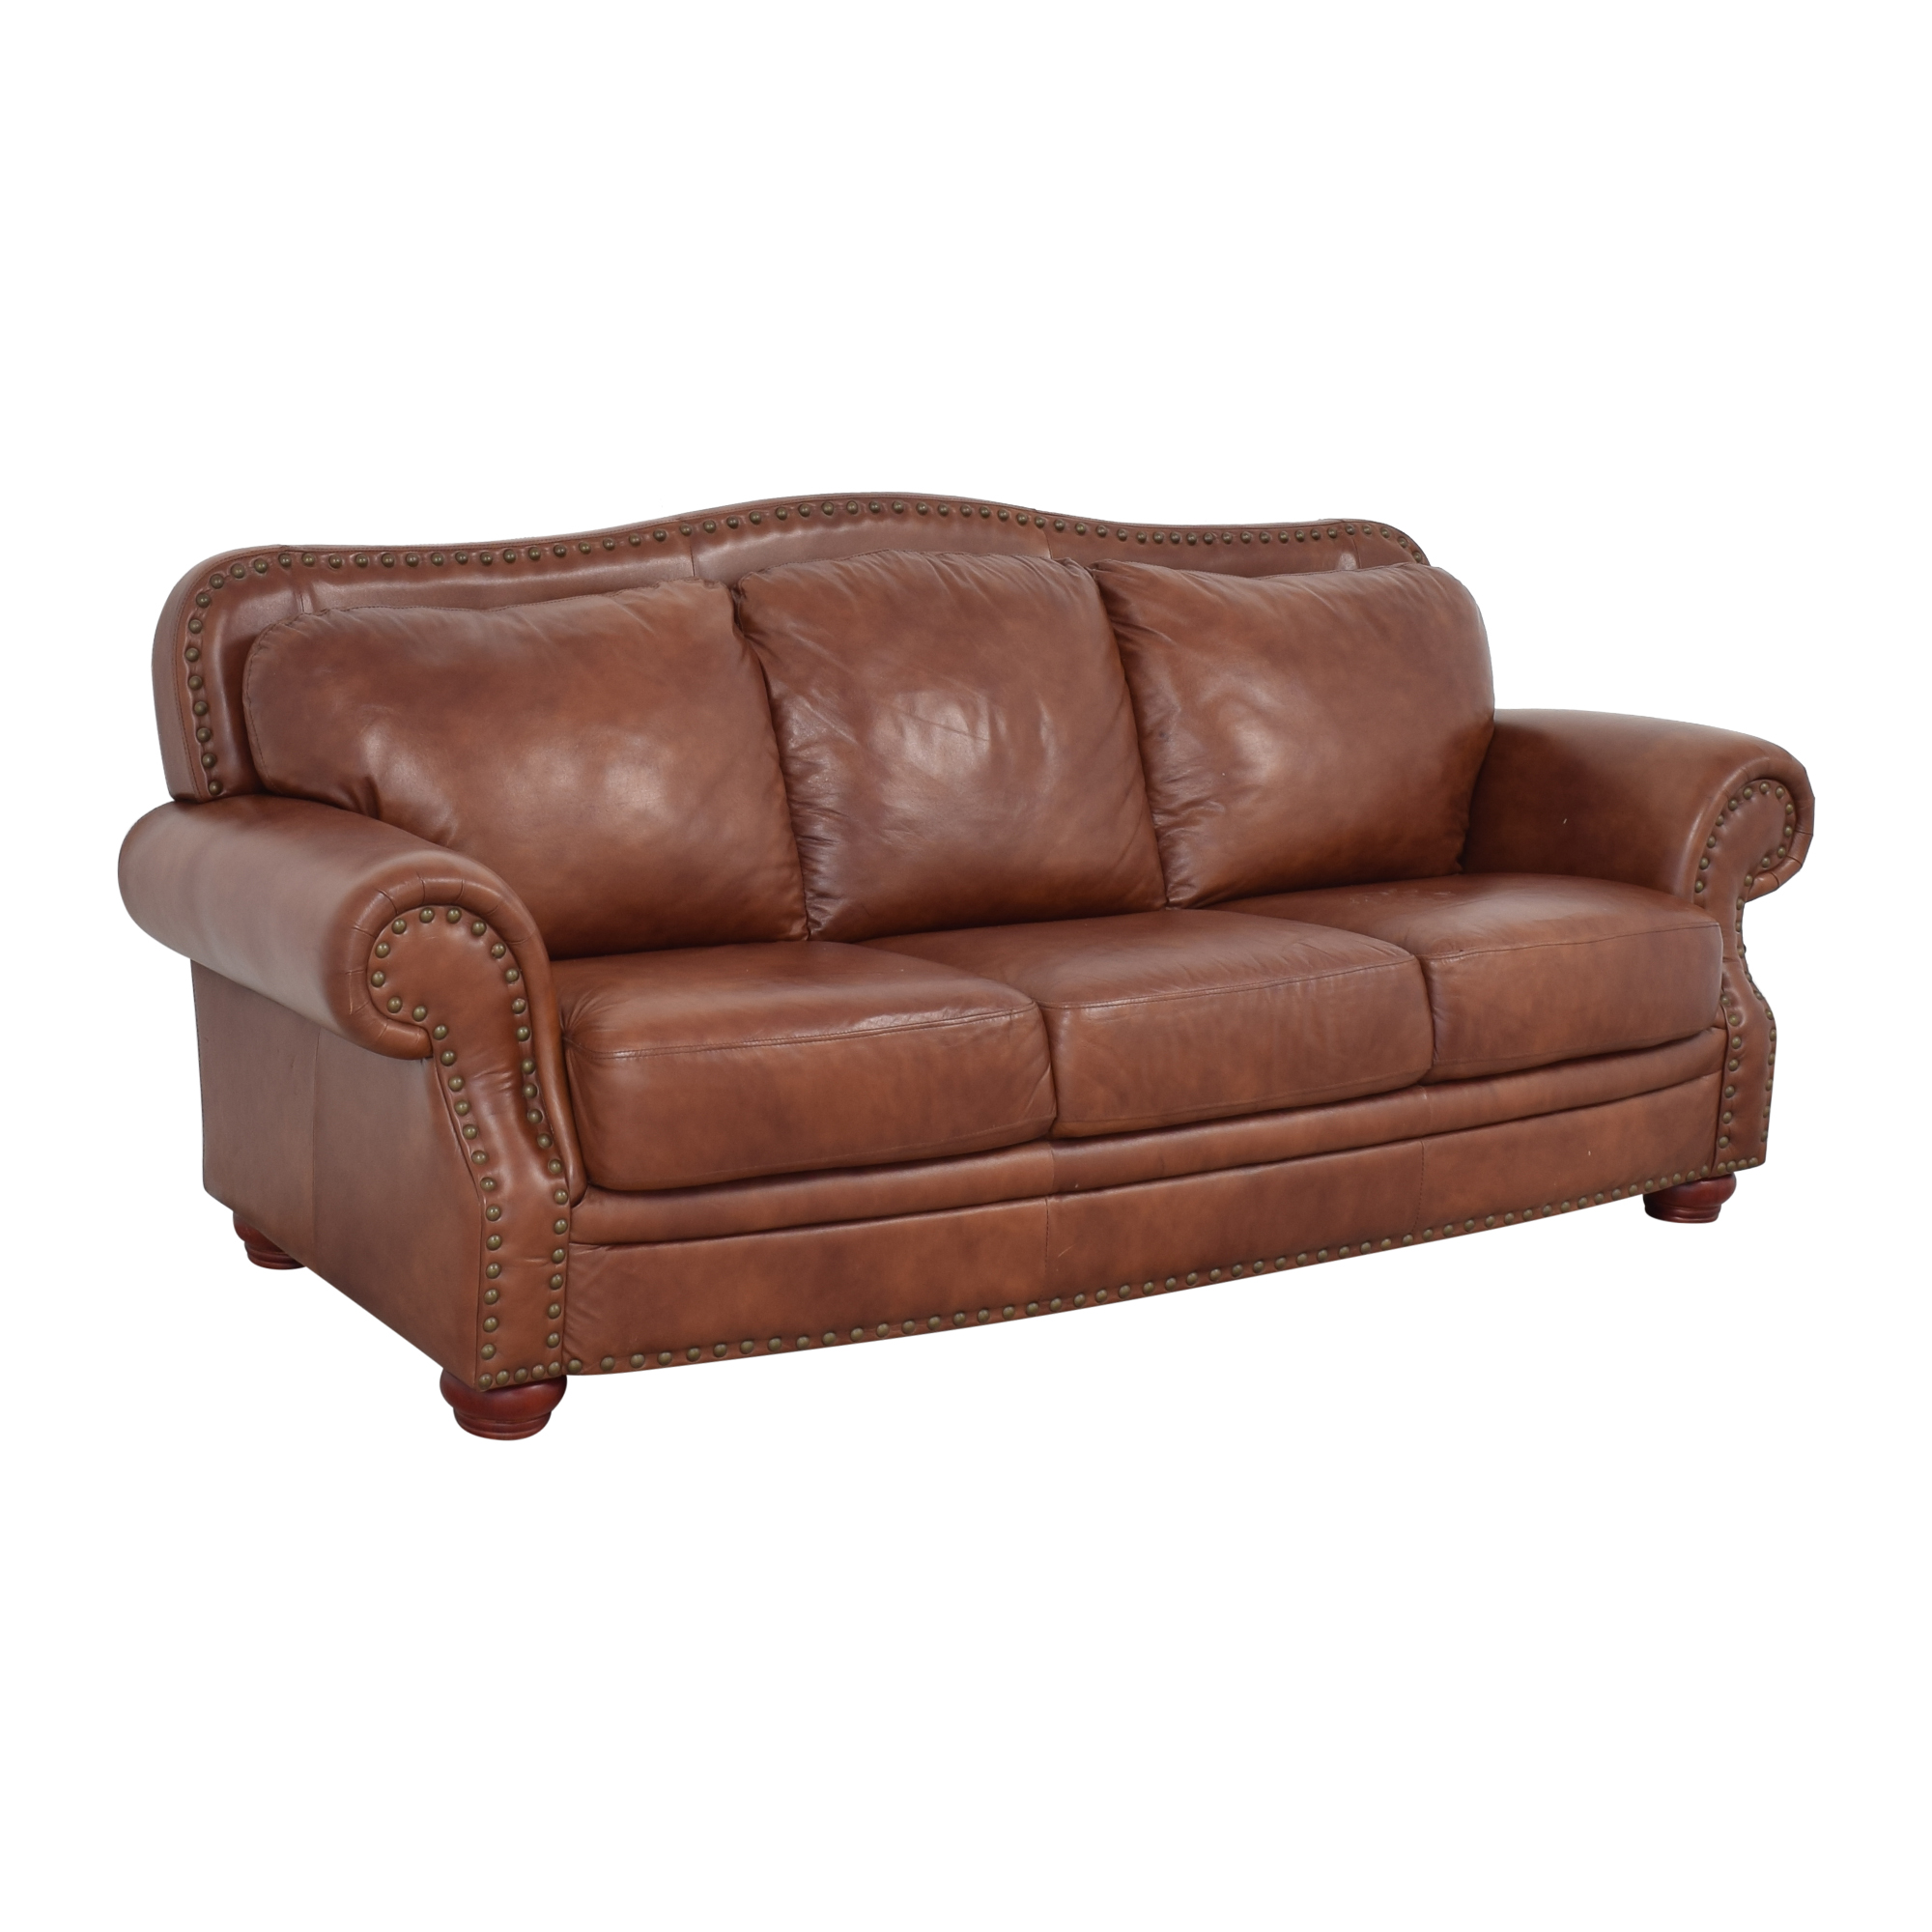 Rolled Arm Camel Back Sofa ma